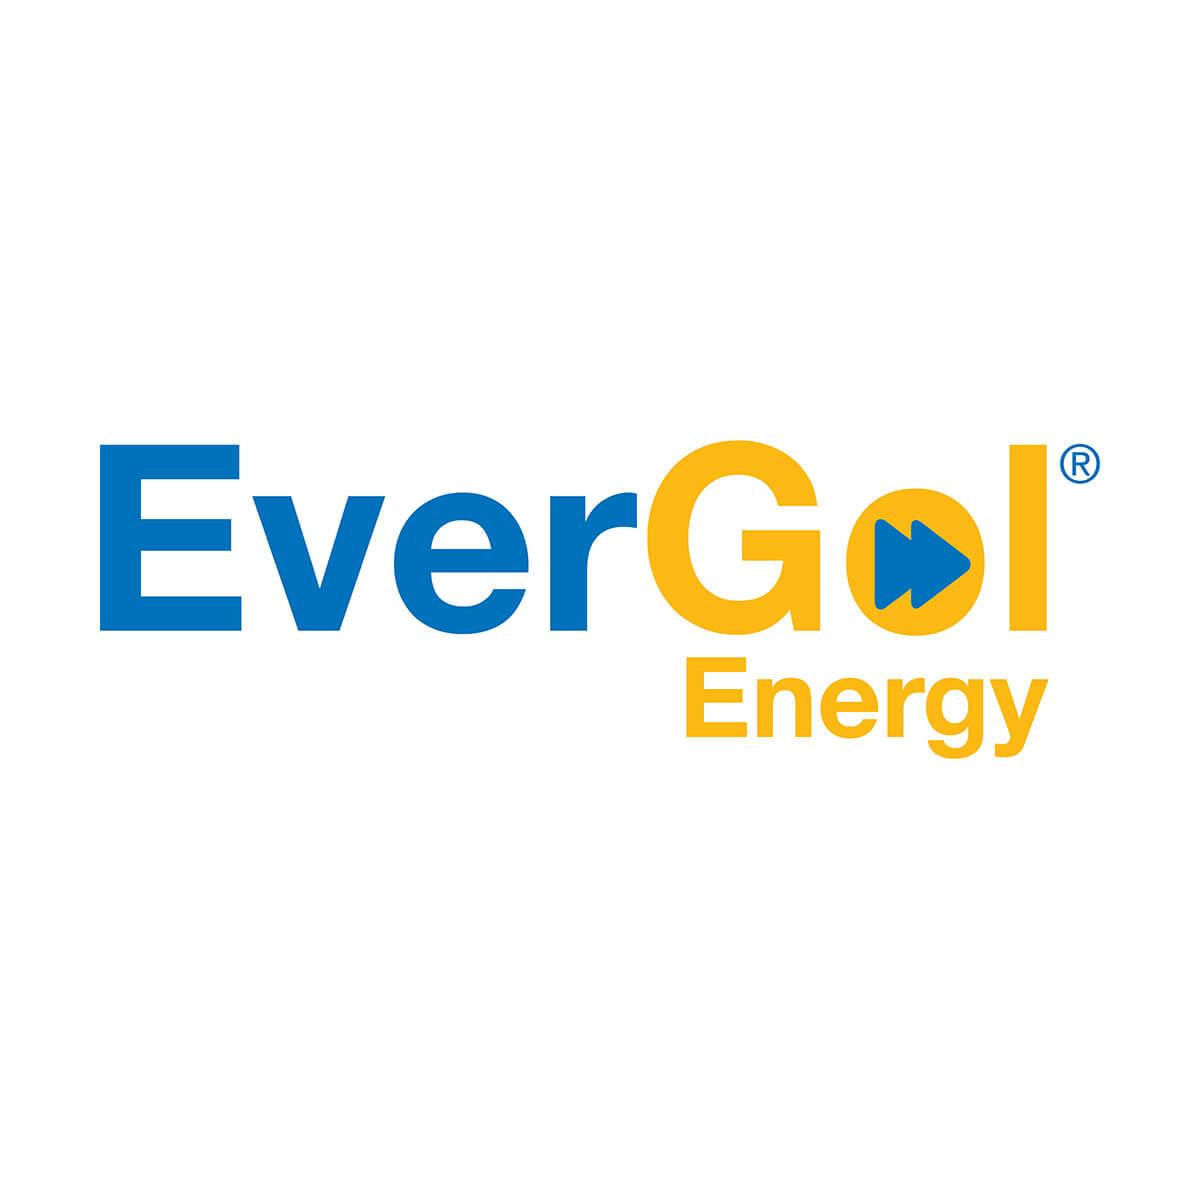 Evergol Energy - 33.75L Jug